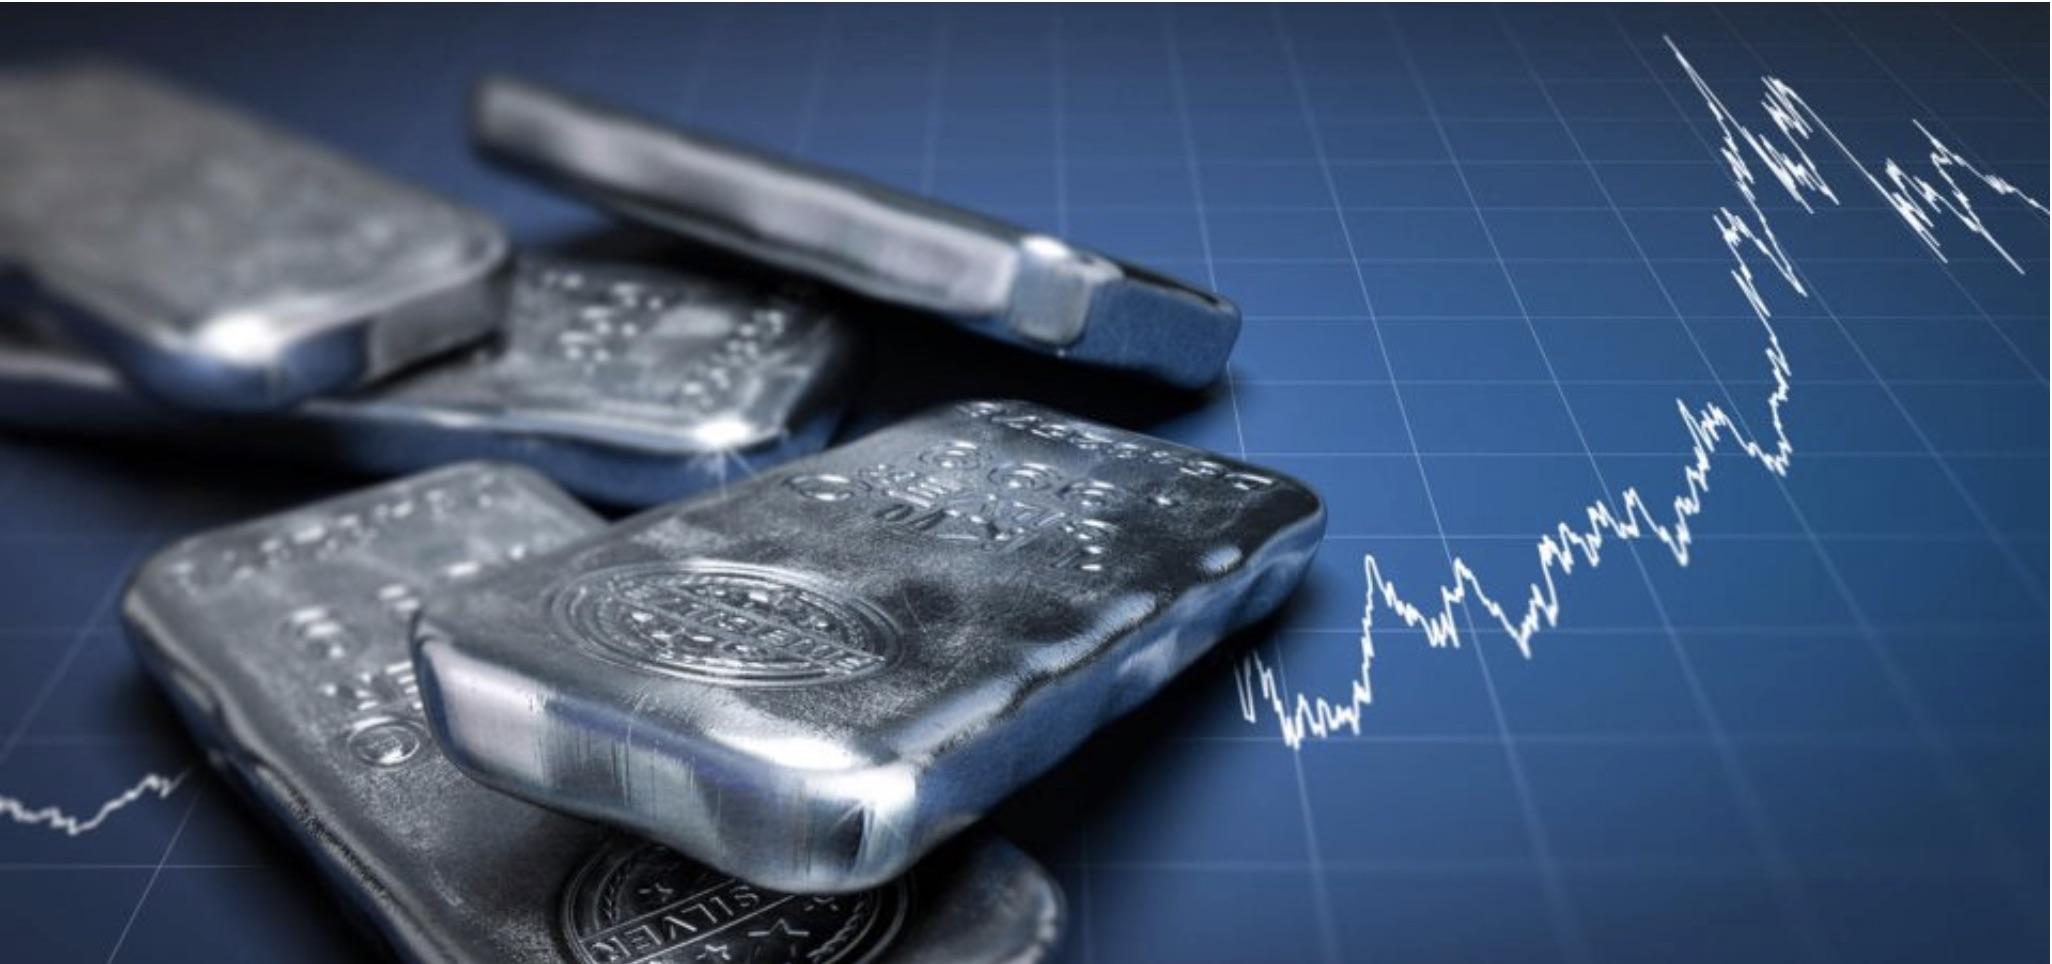 King-World-News-Bullenmarkt-Signal-James-Turk-sagt-Gold-Silber-Märkte-extrem-gut-Gebot-zu-Start-2018